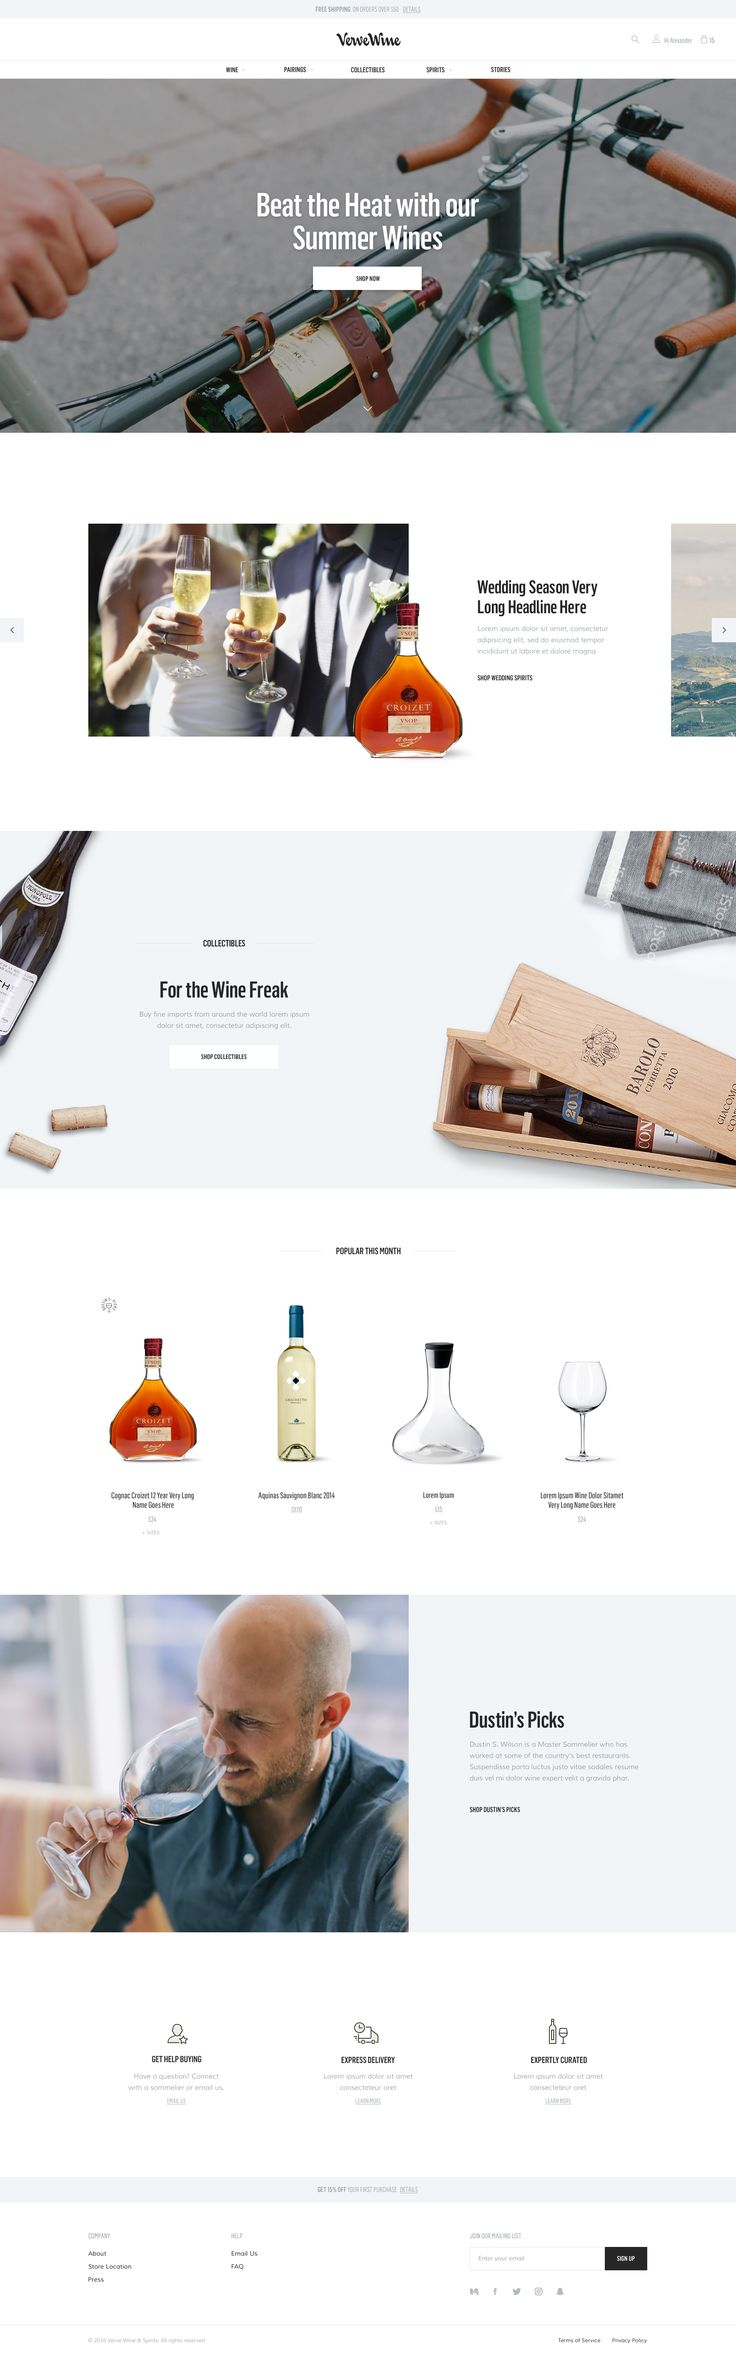 Verve Wine – Ui design concept for e-commerce #rwd website, by UENO.